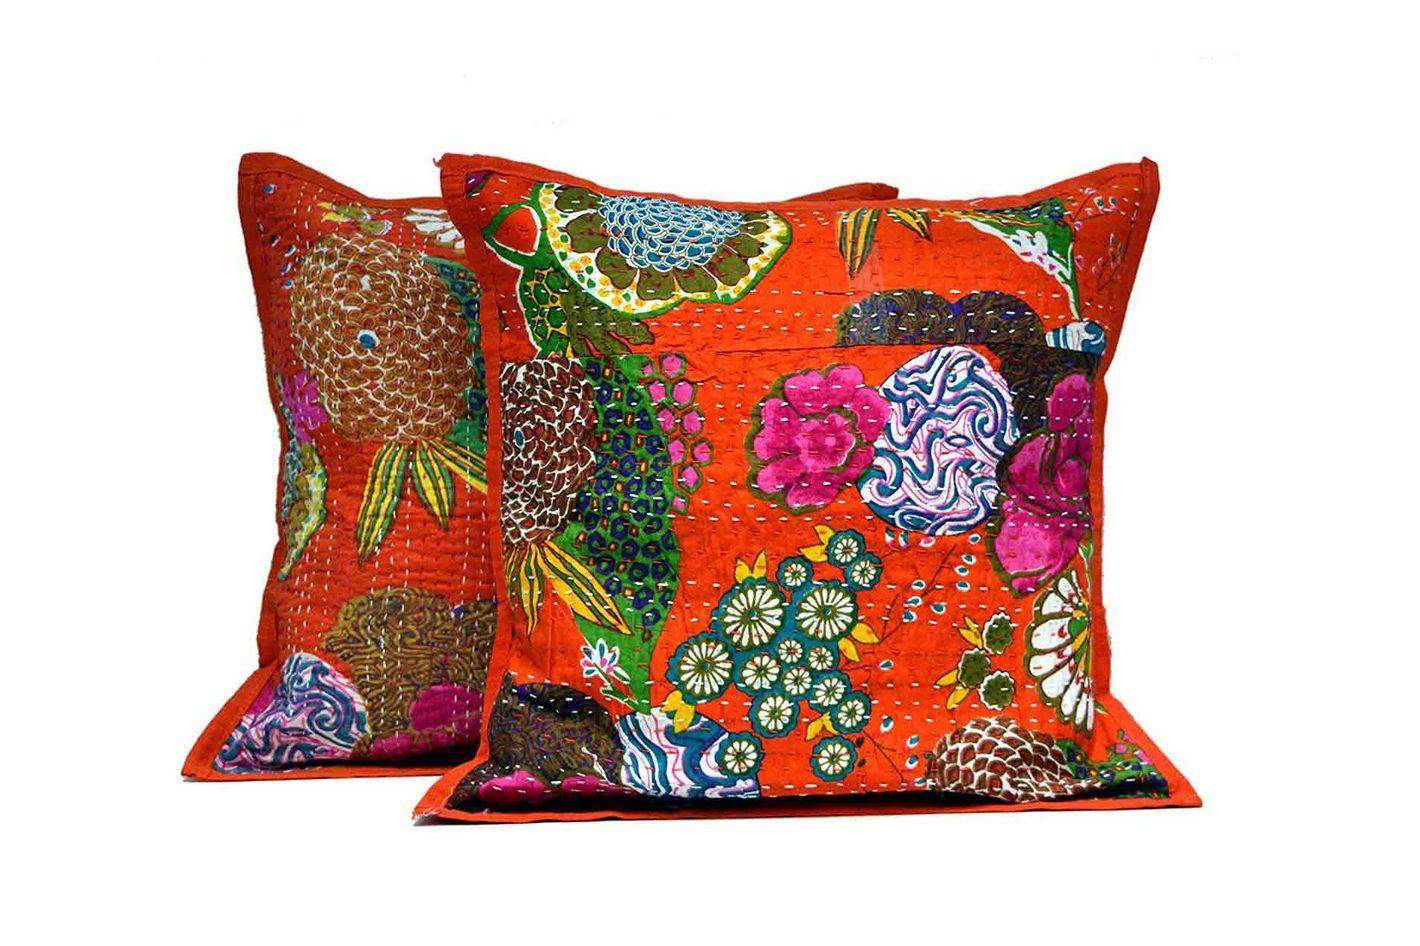 Krishna Mart India Pillowcases, 2